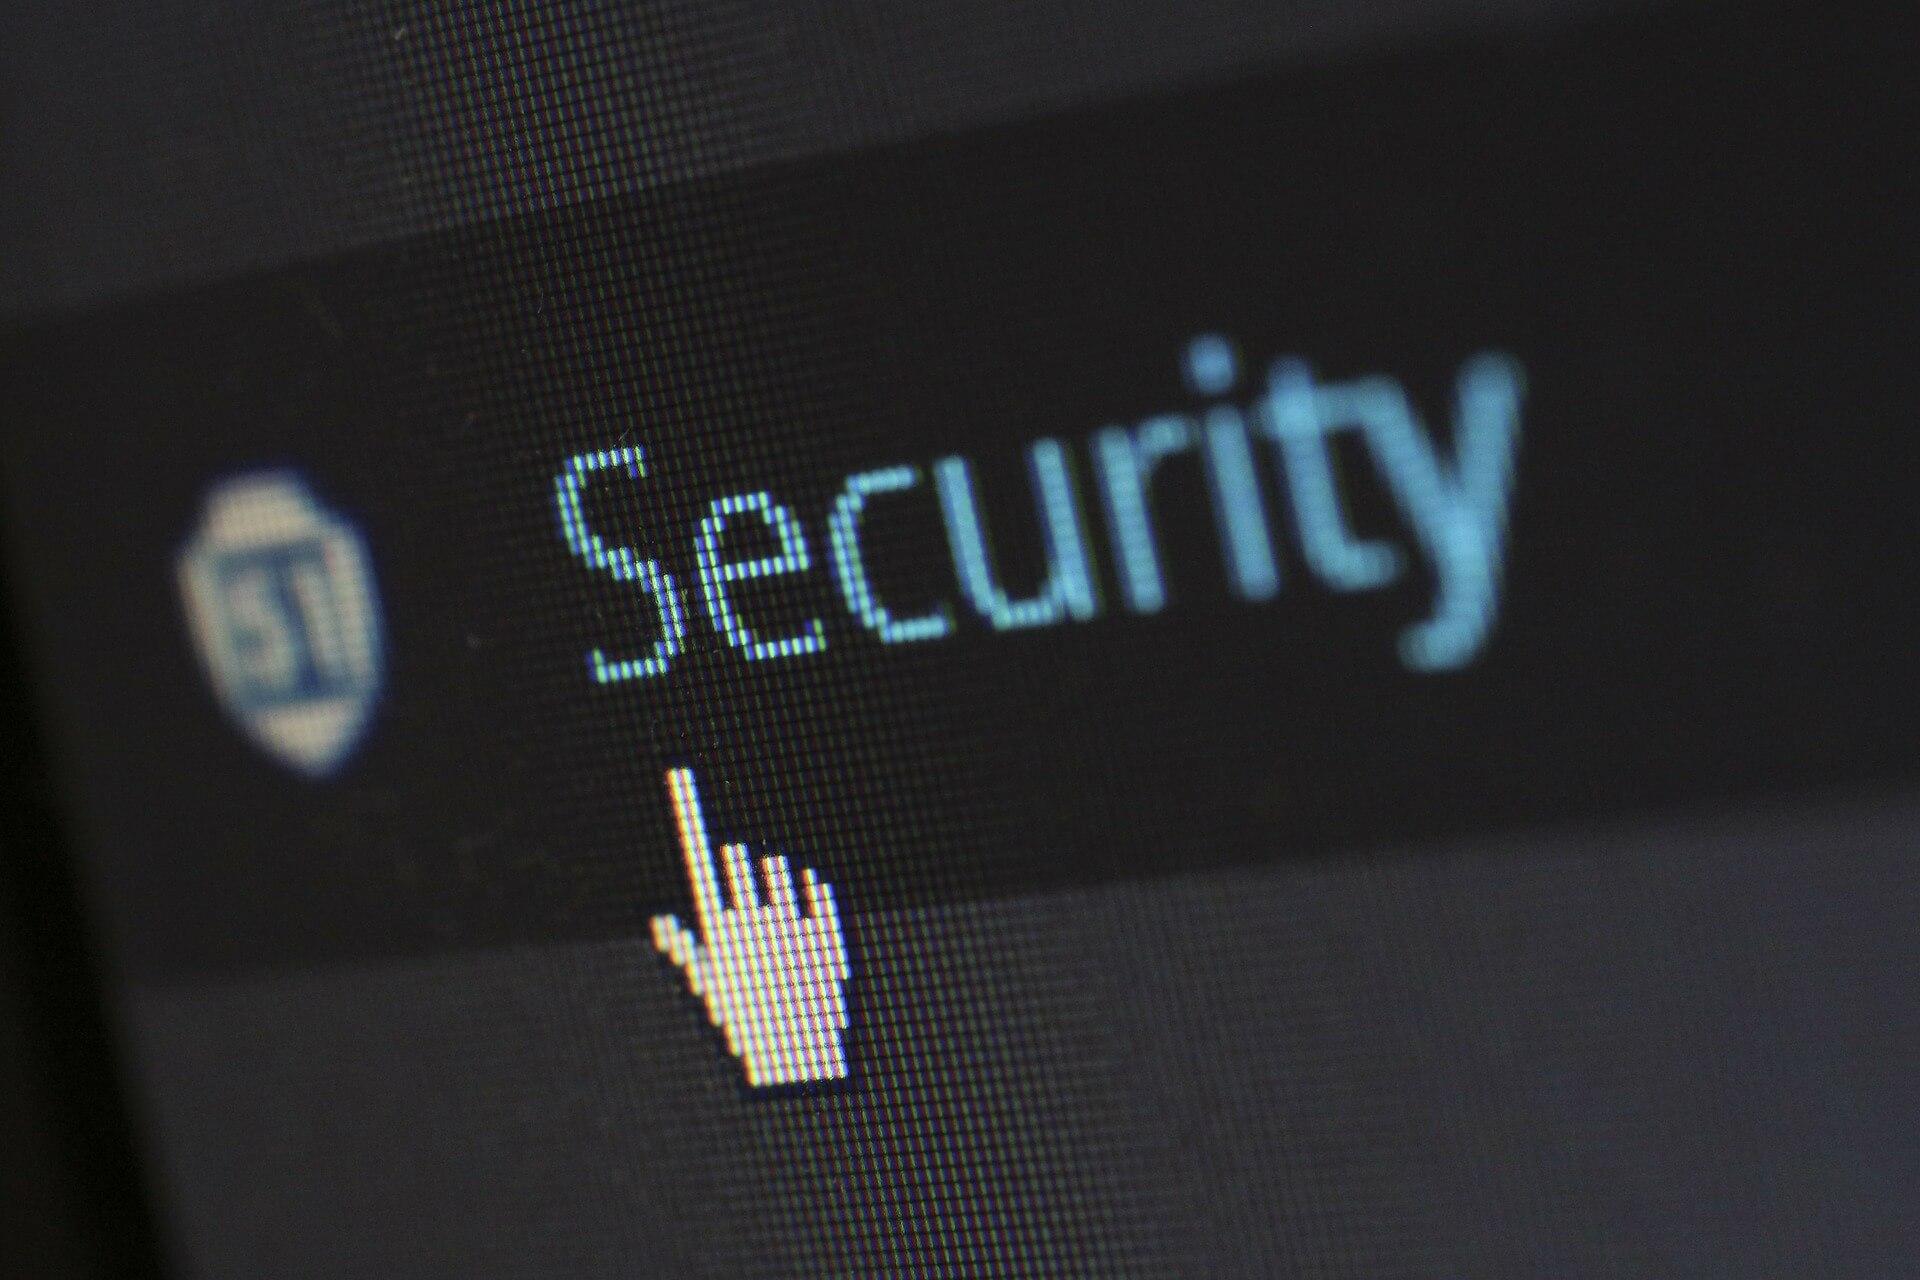 Security work